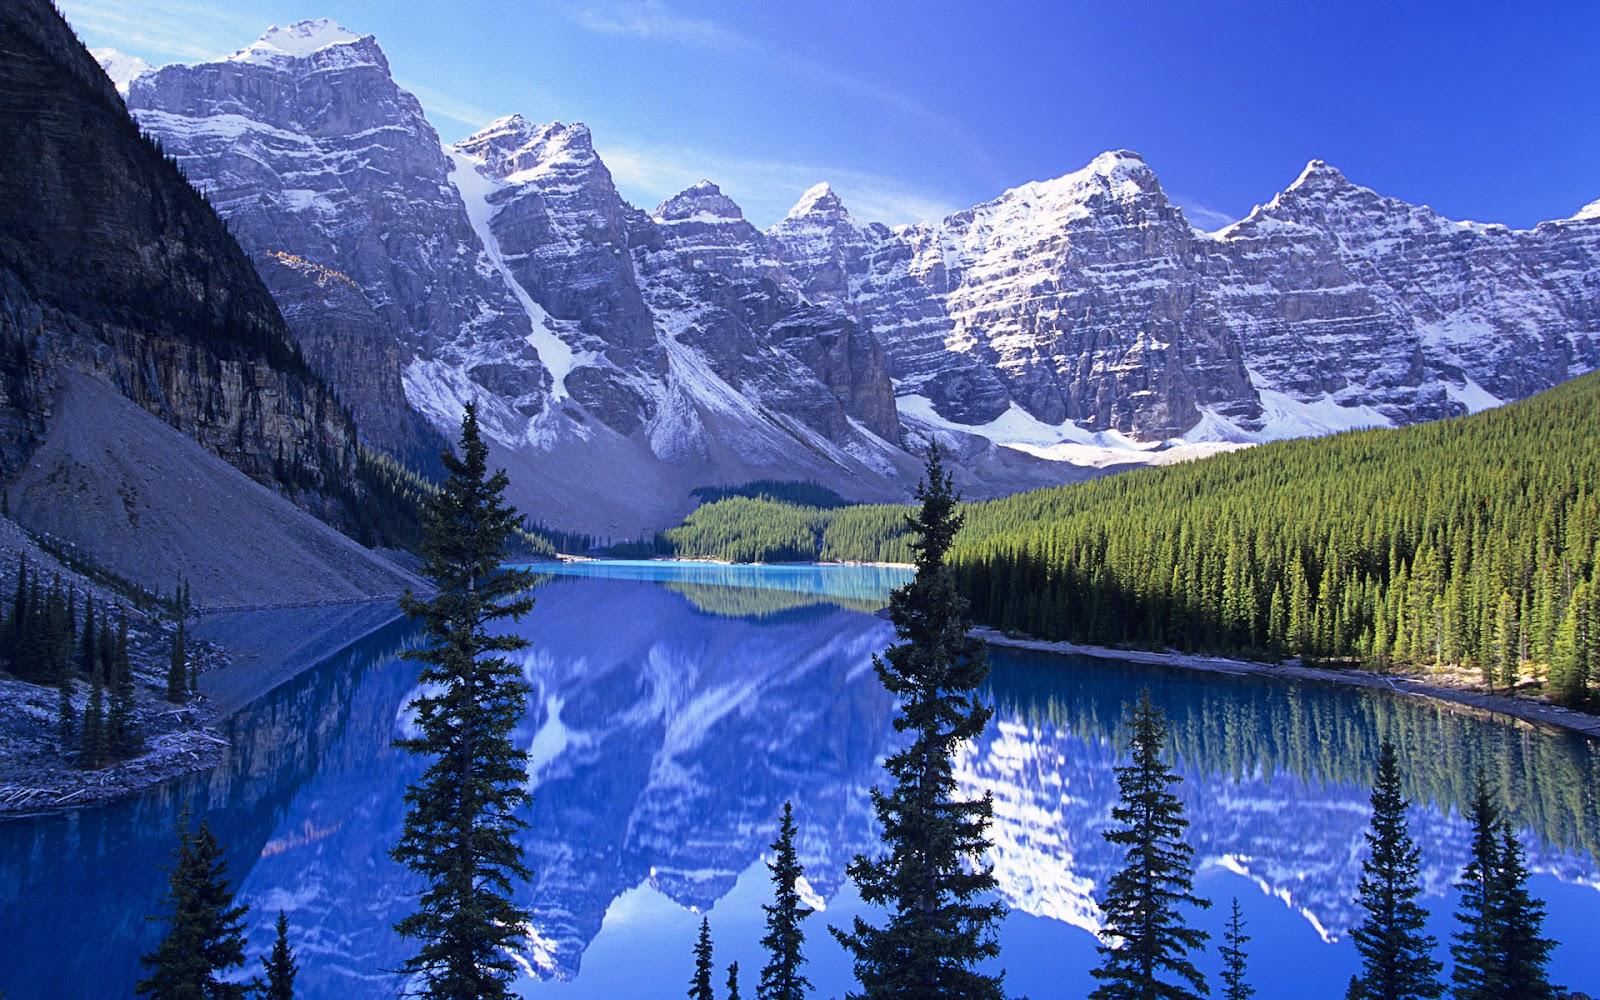 wallpaper pegunungan